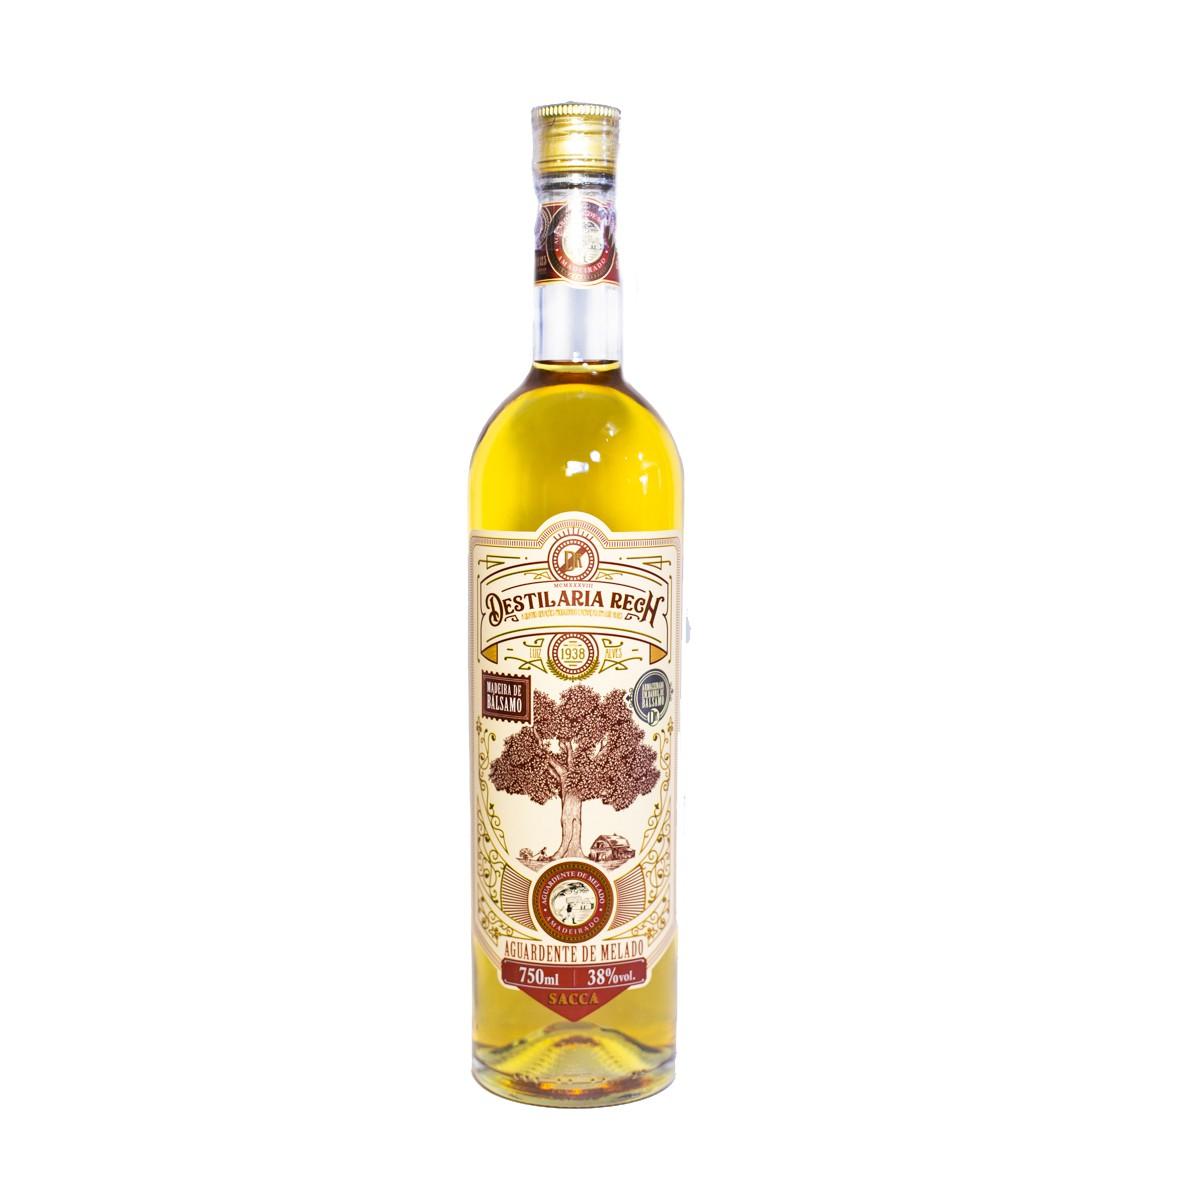 Cachaça de Bálsamo - Rech - 750 ml